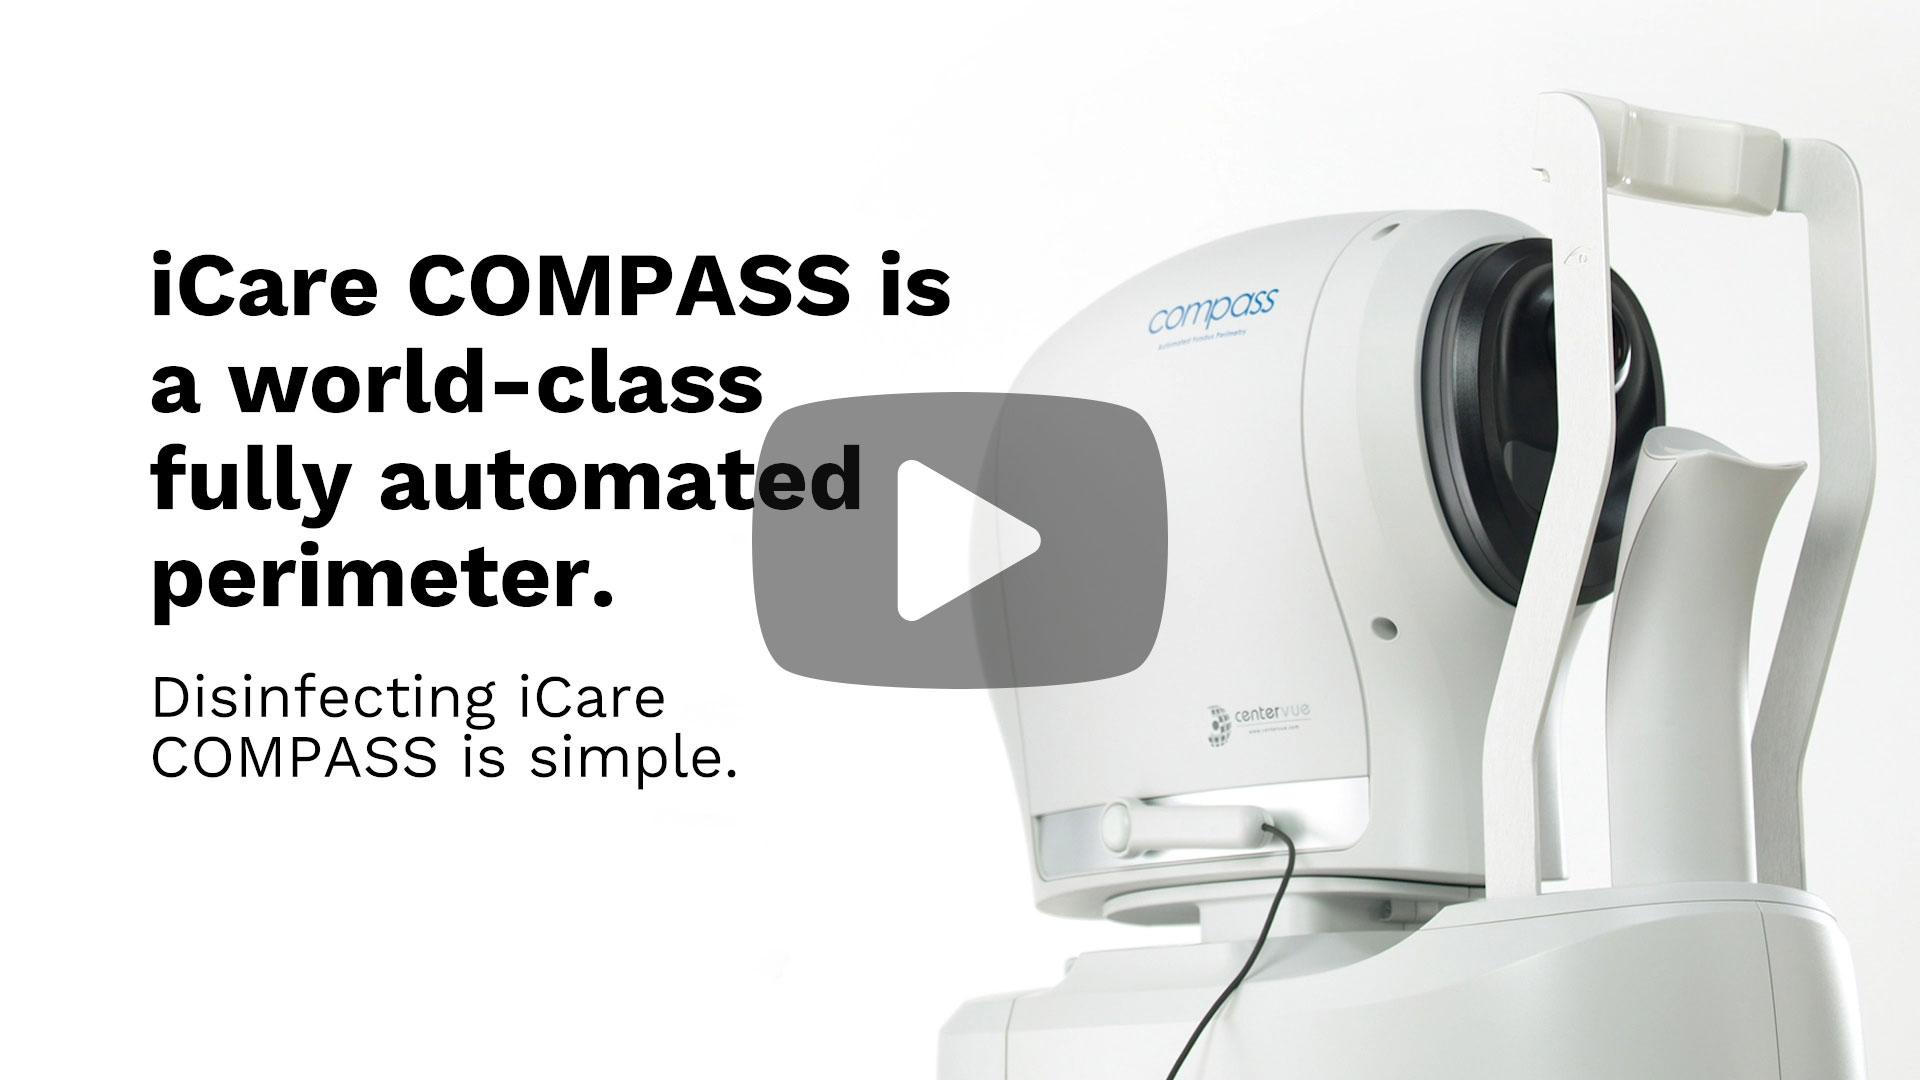 iCare COMPASS